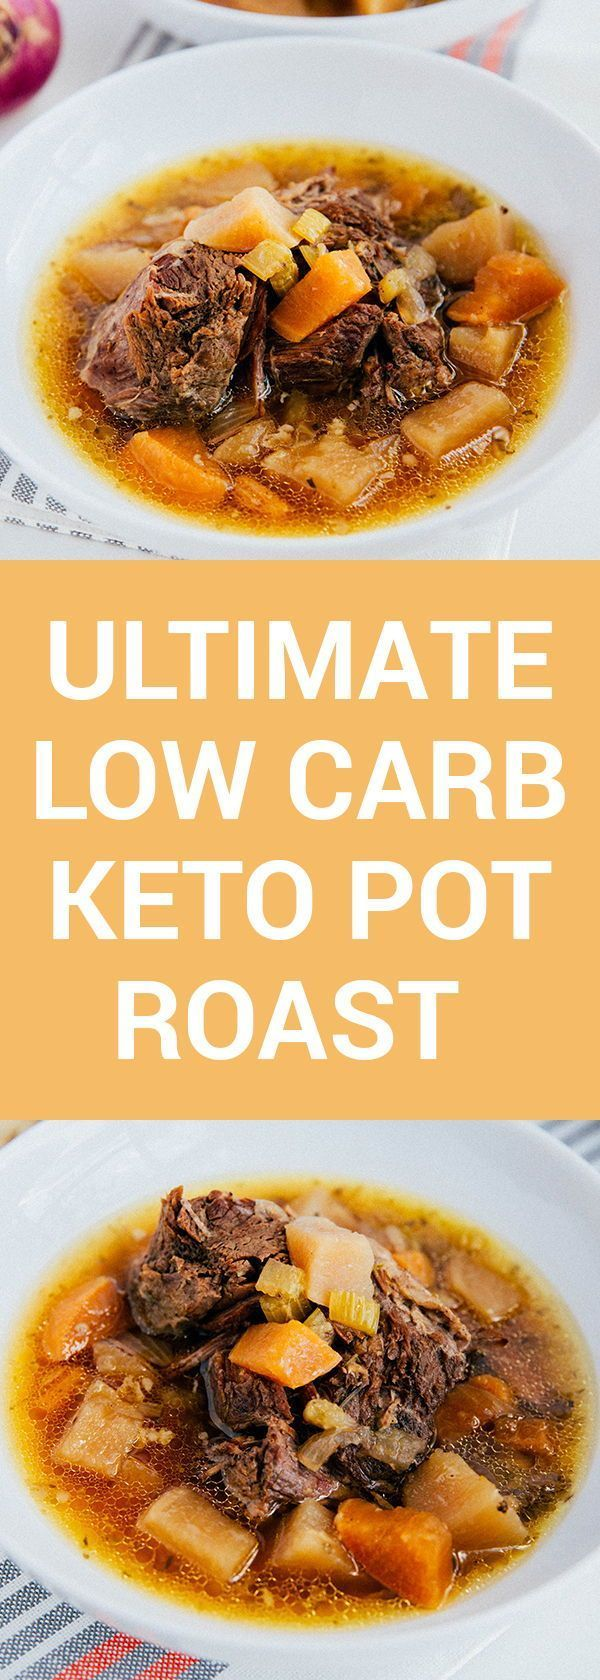 Ultimate Low-Carb Keto Pot Roast